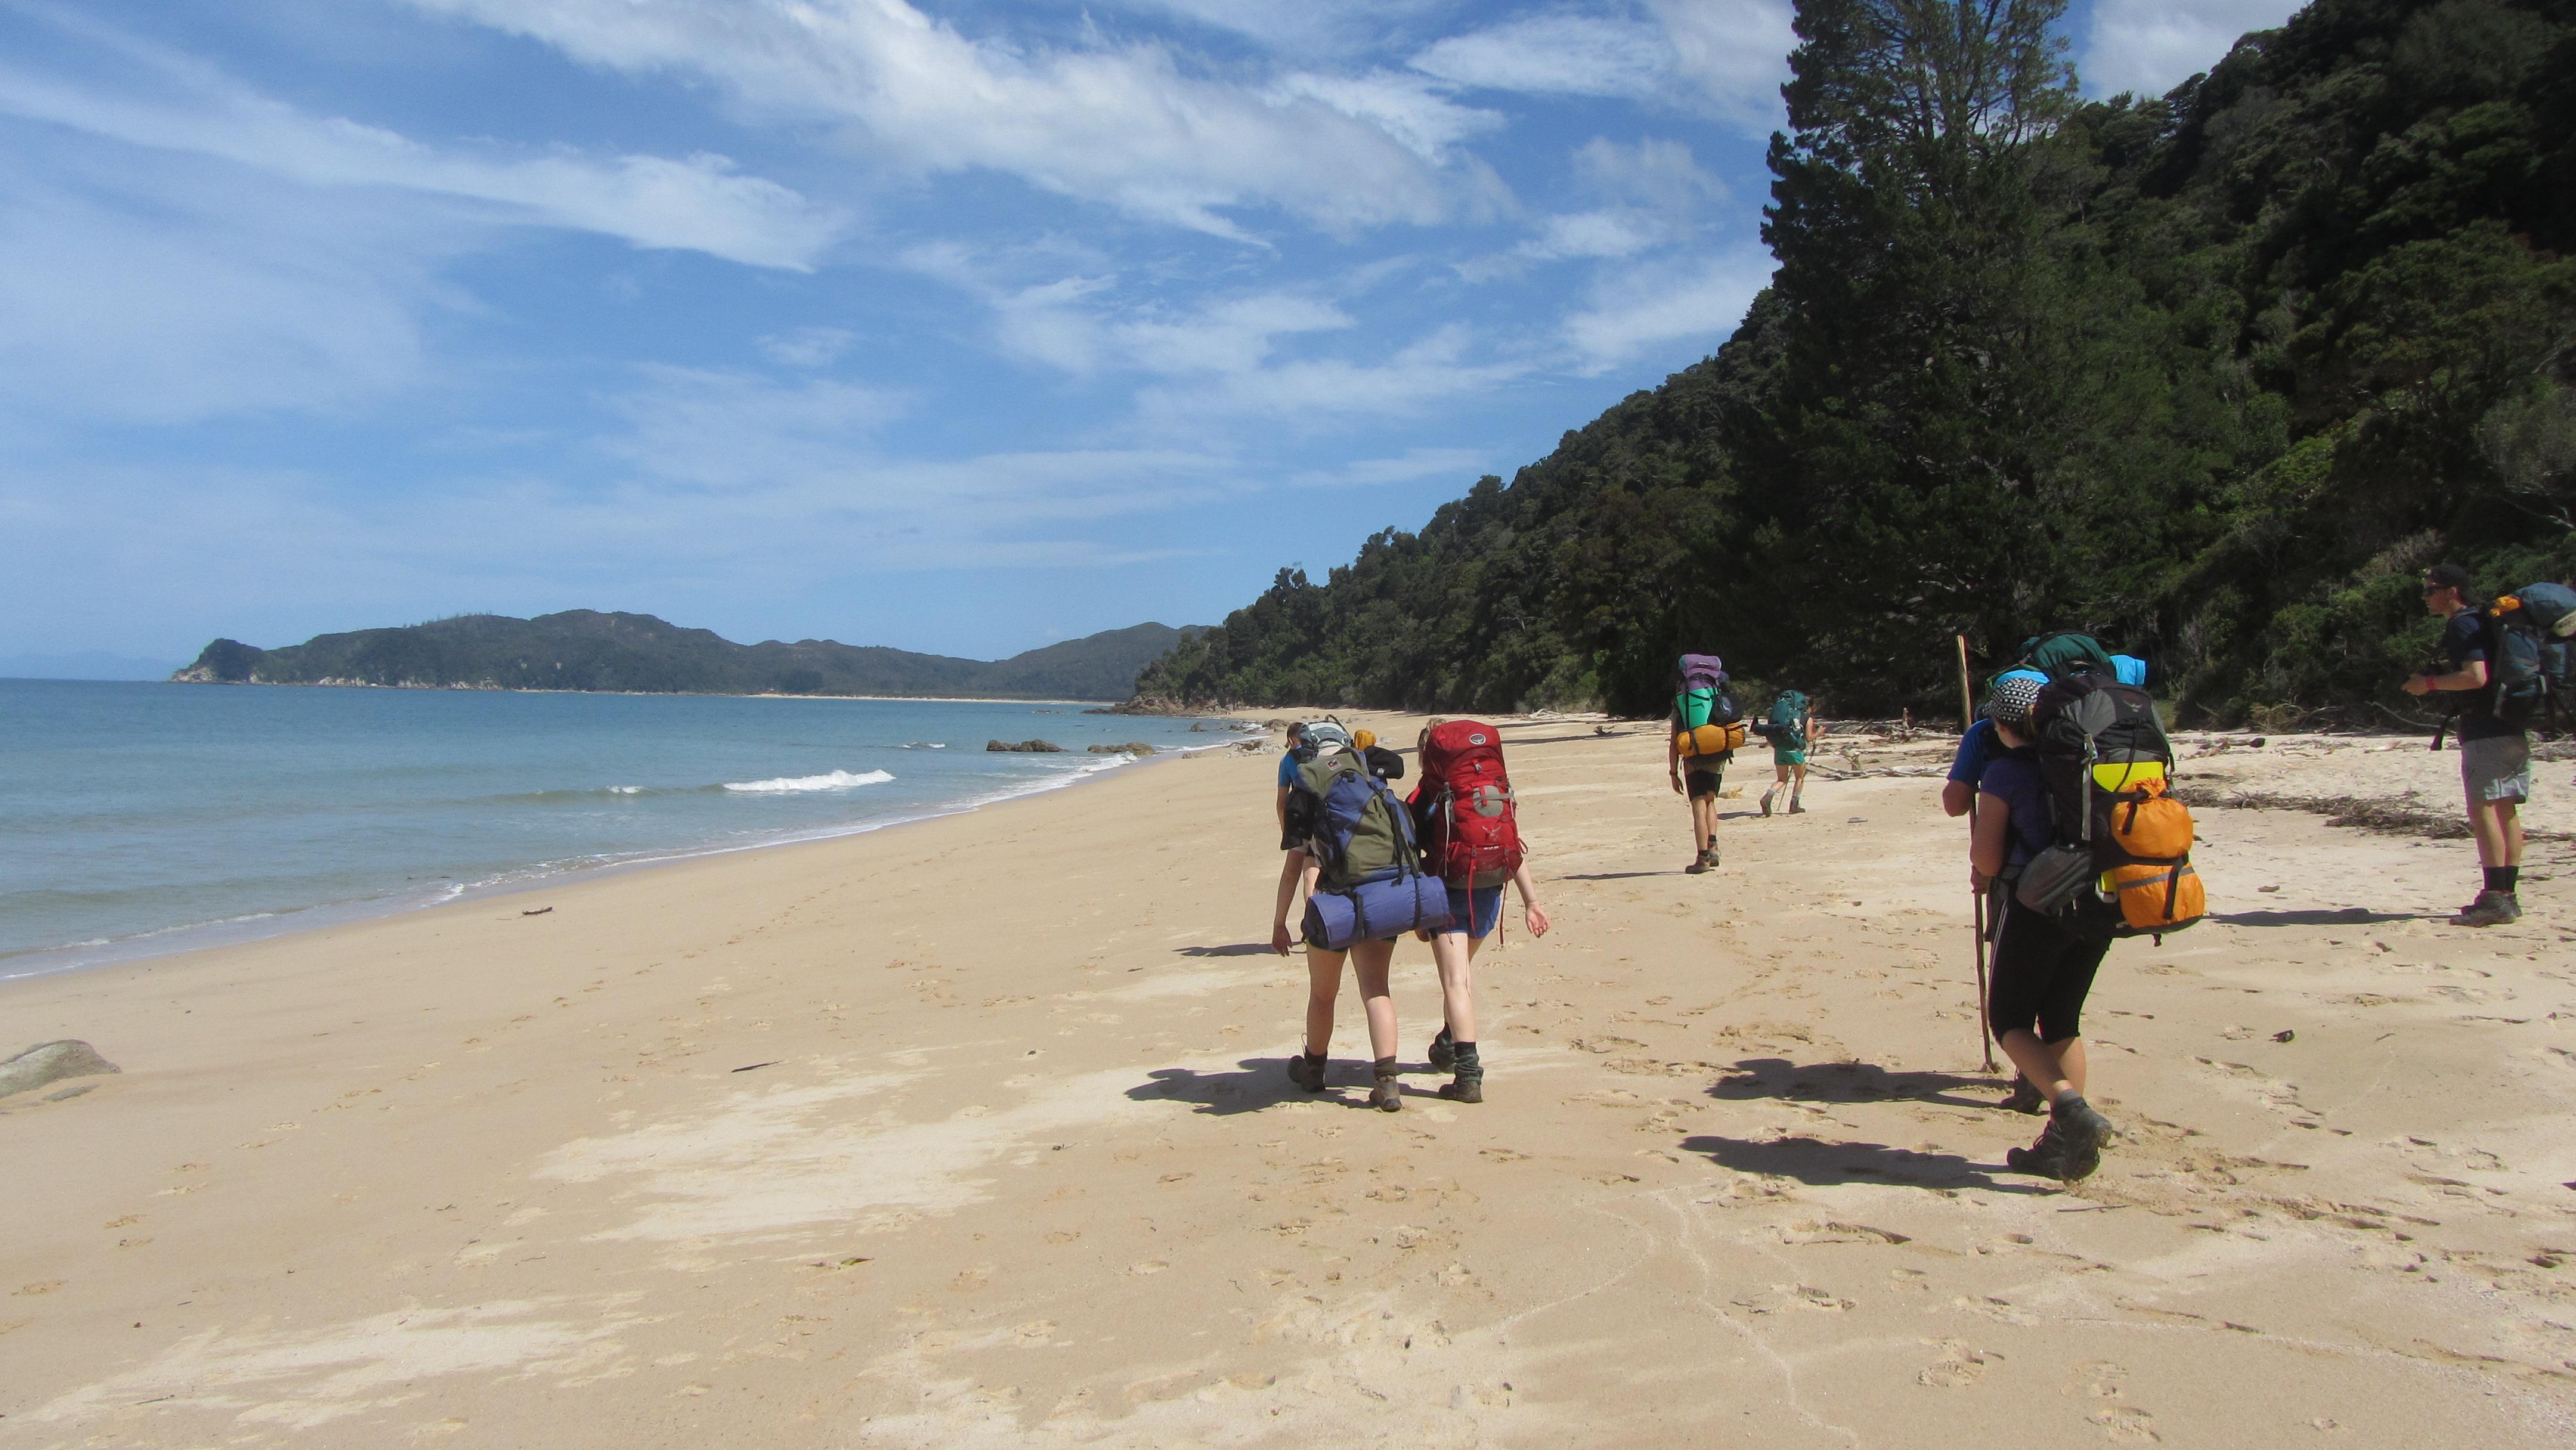 Beach Tramping on Abel Tasman E3 expedition. [Christy McKessar]